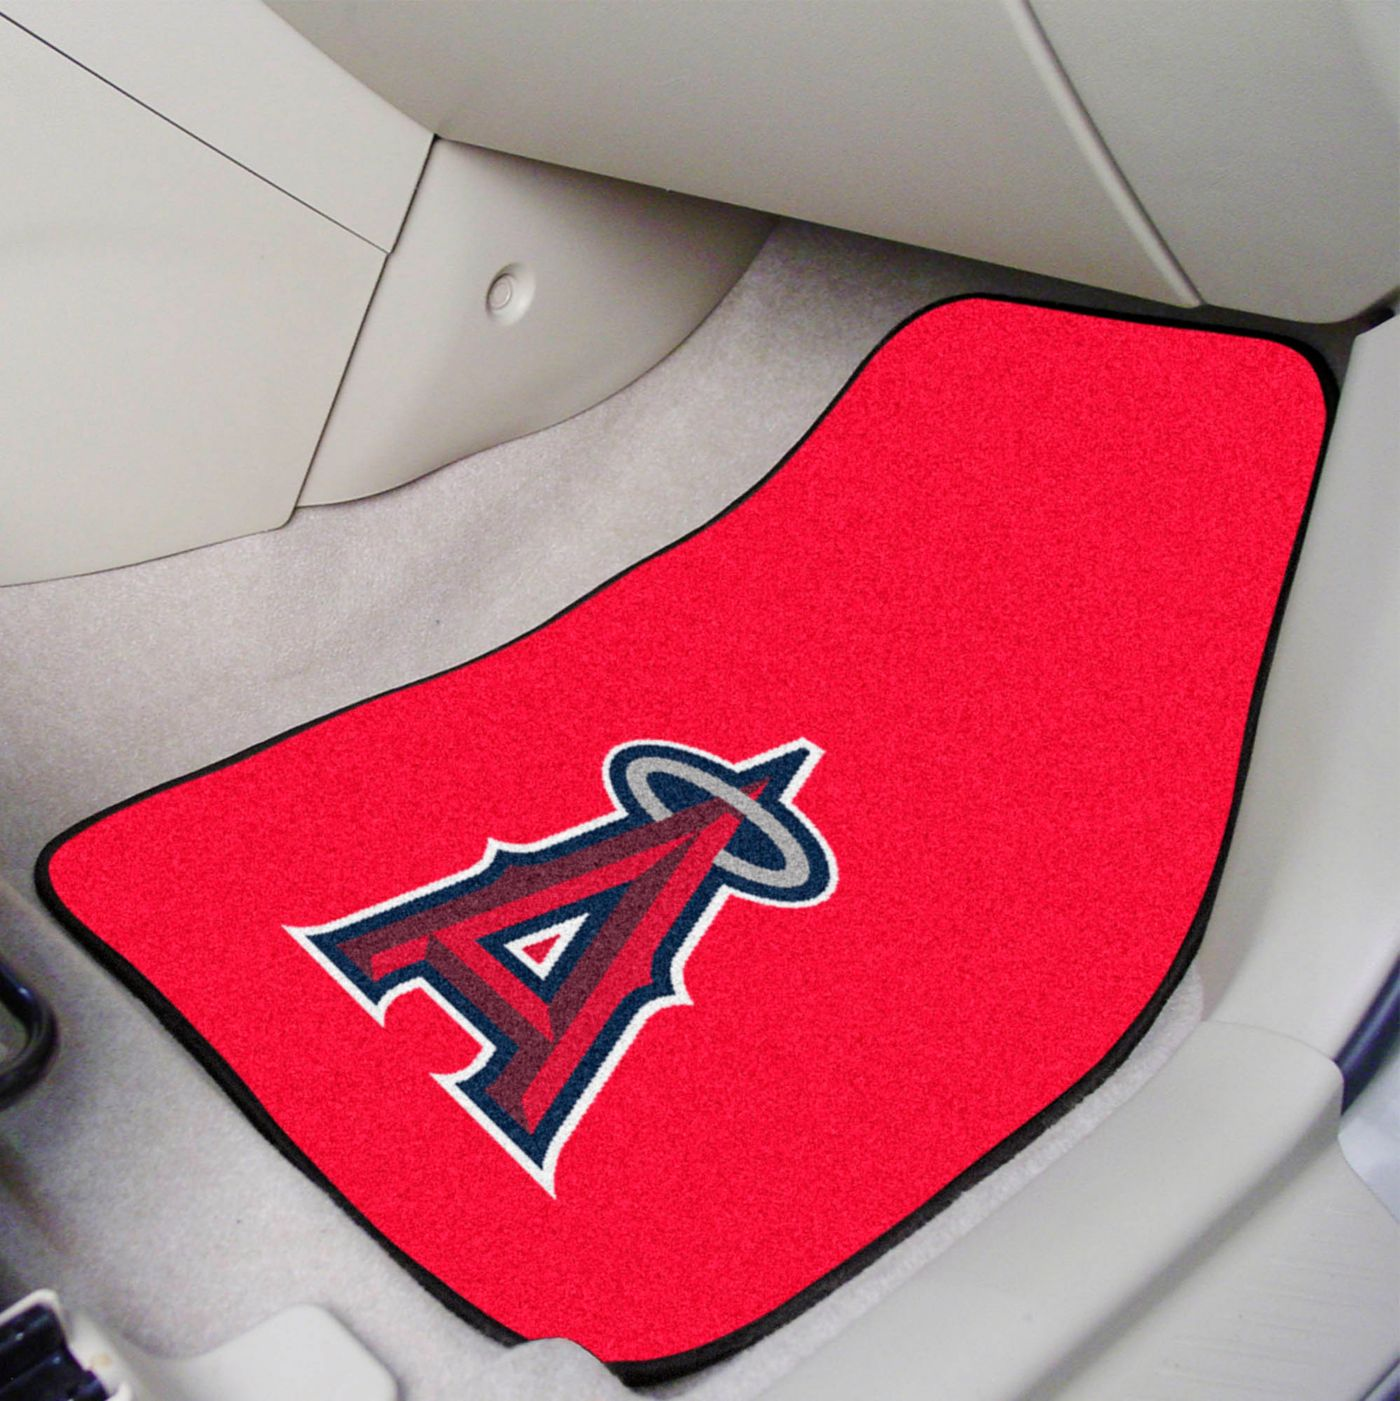 FANMATS Los Angeles Angels Printed Car Mats 2-Pack